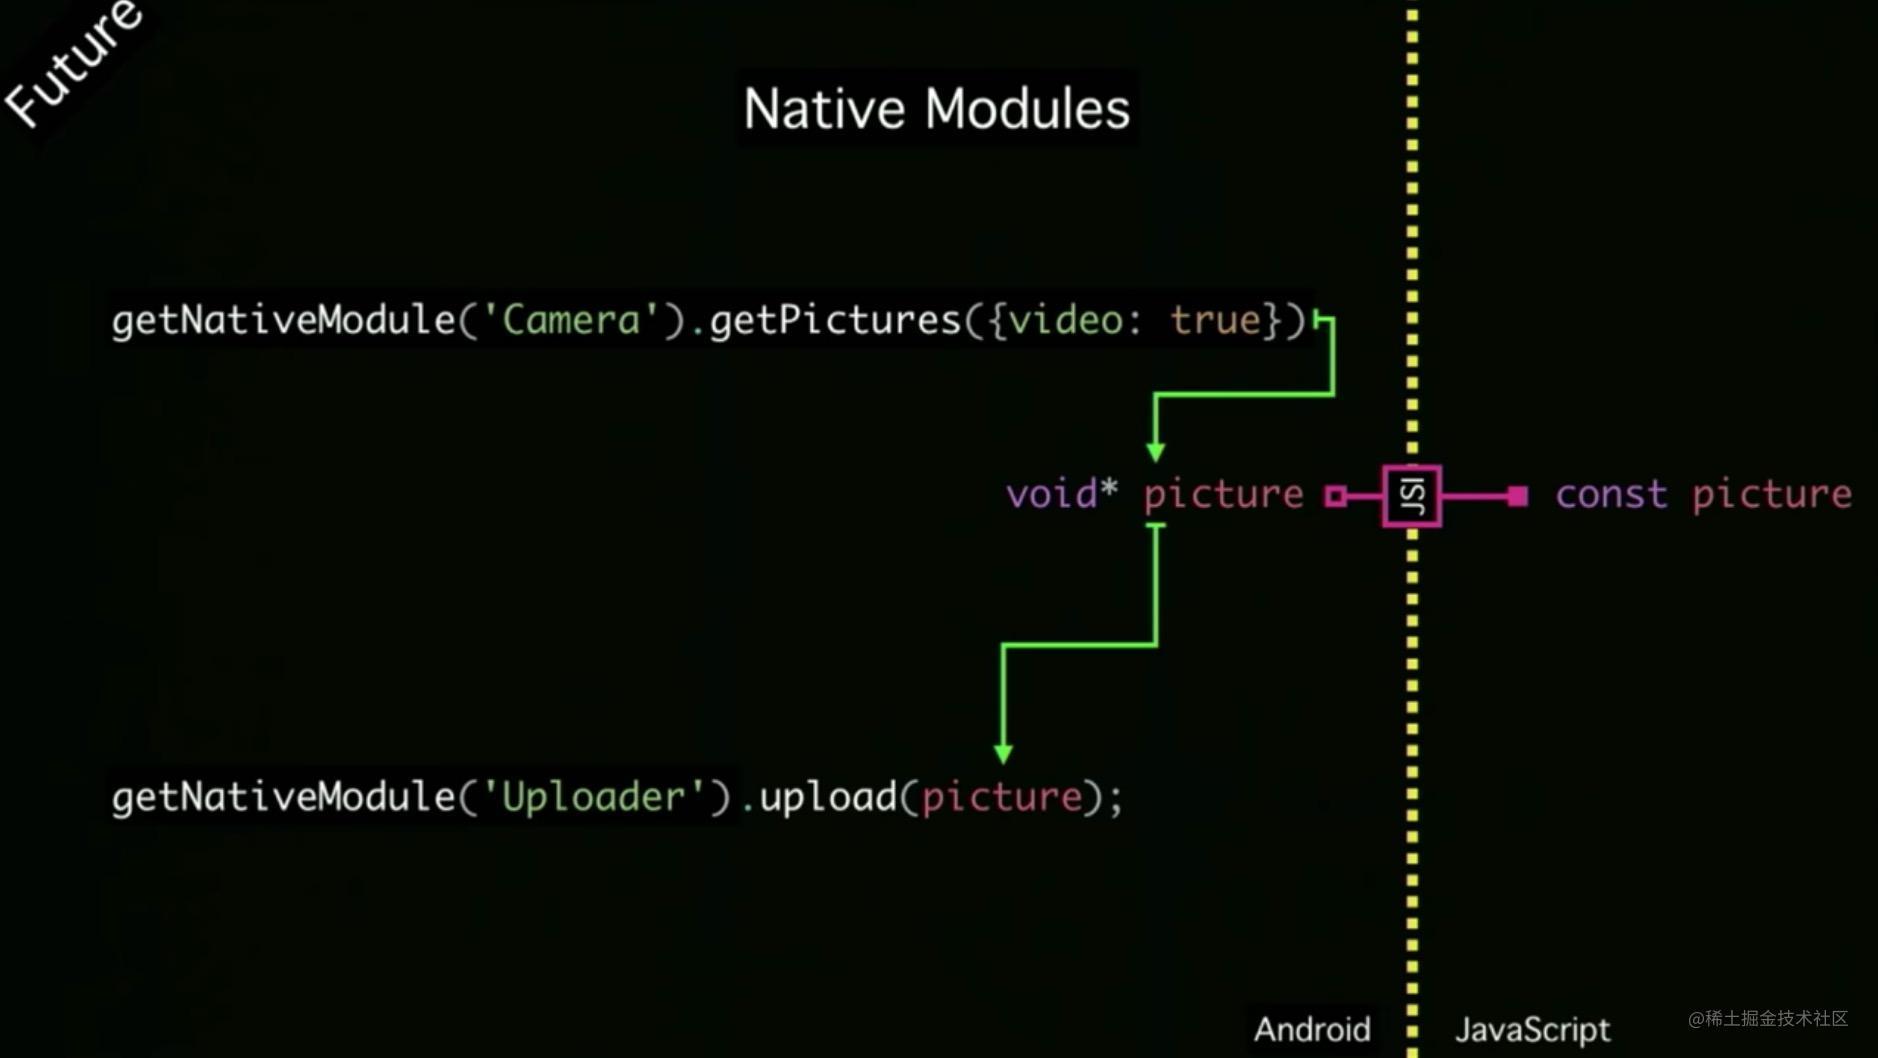 Native Modules call new